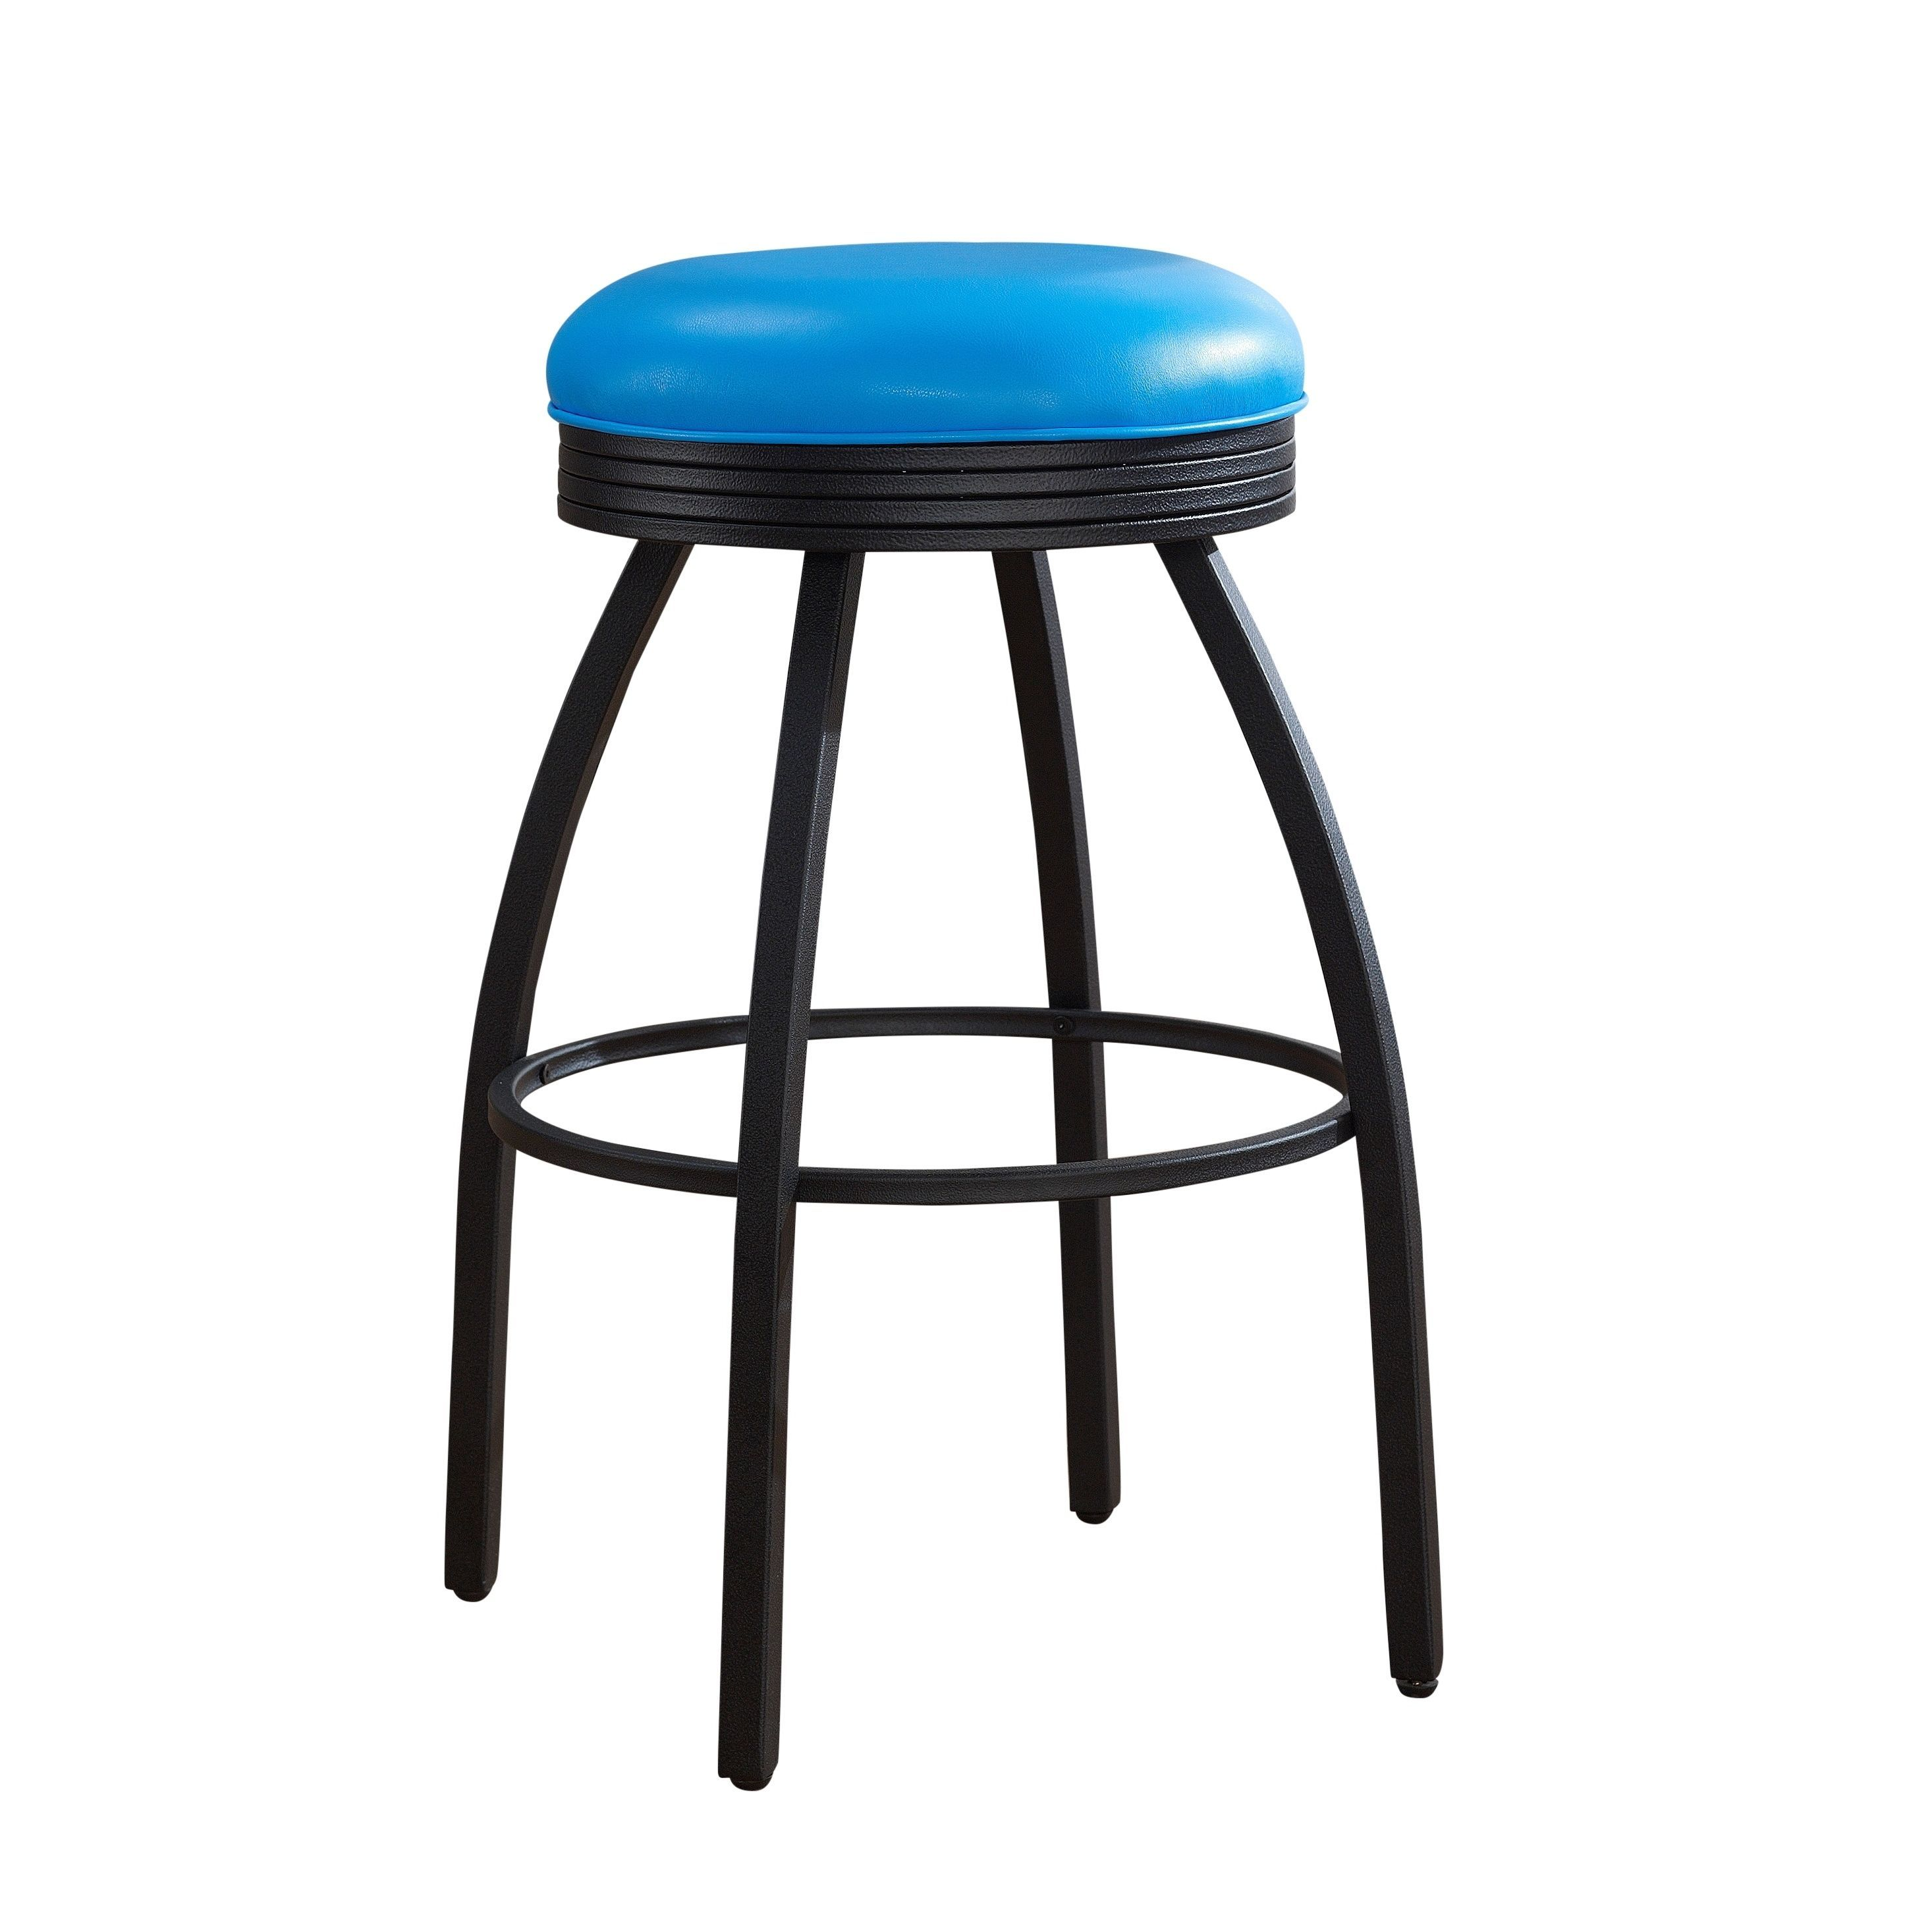 American Sadie 26-inch Blue Metal Counter Height Stool (Sadie Counter Height Stool in Blue) (Bonded Leather)